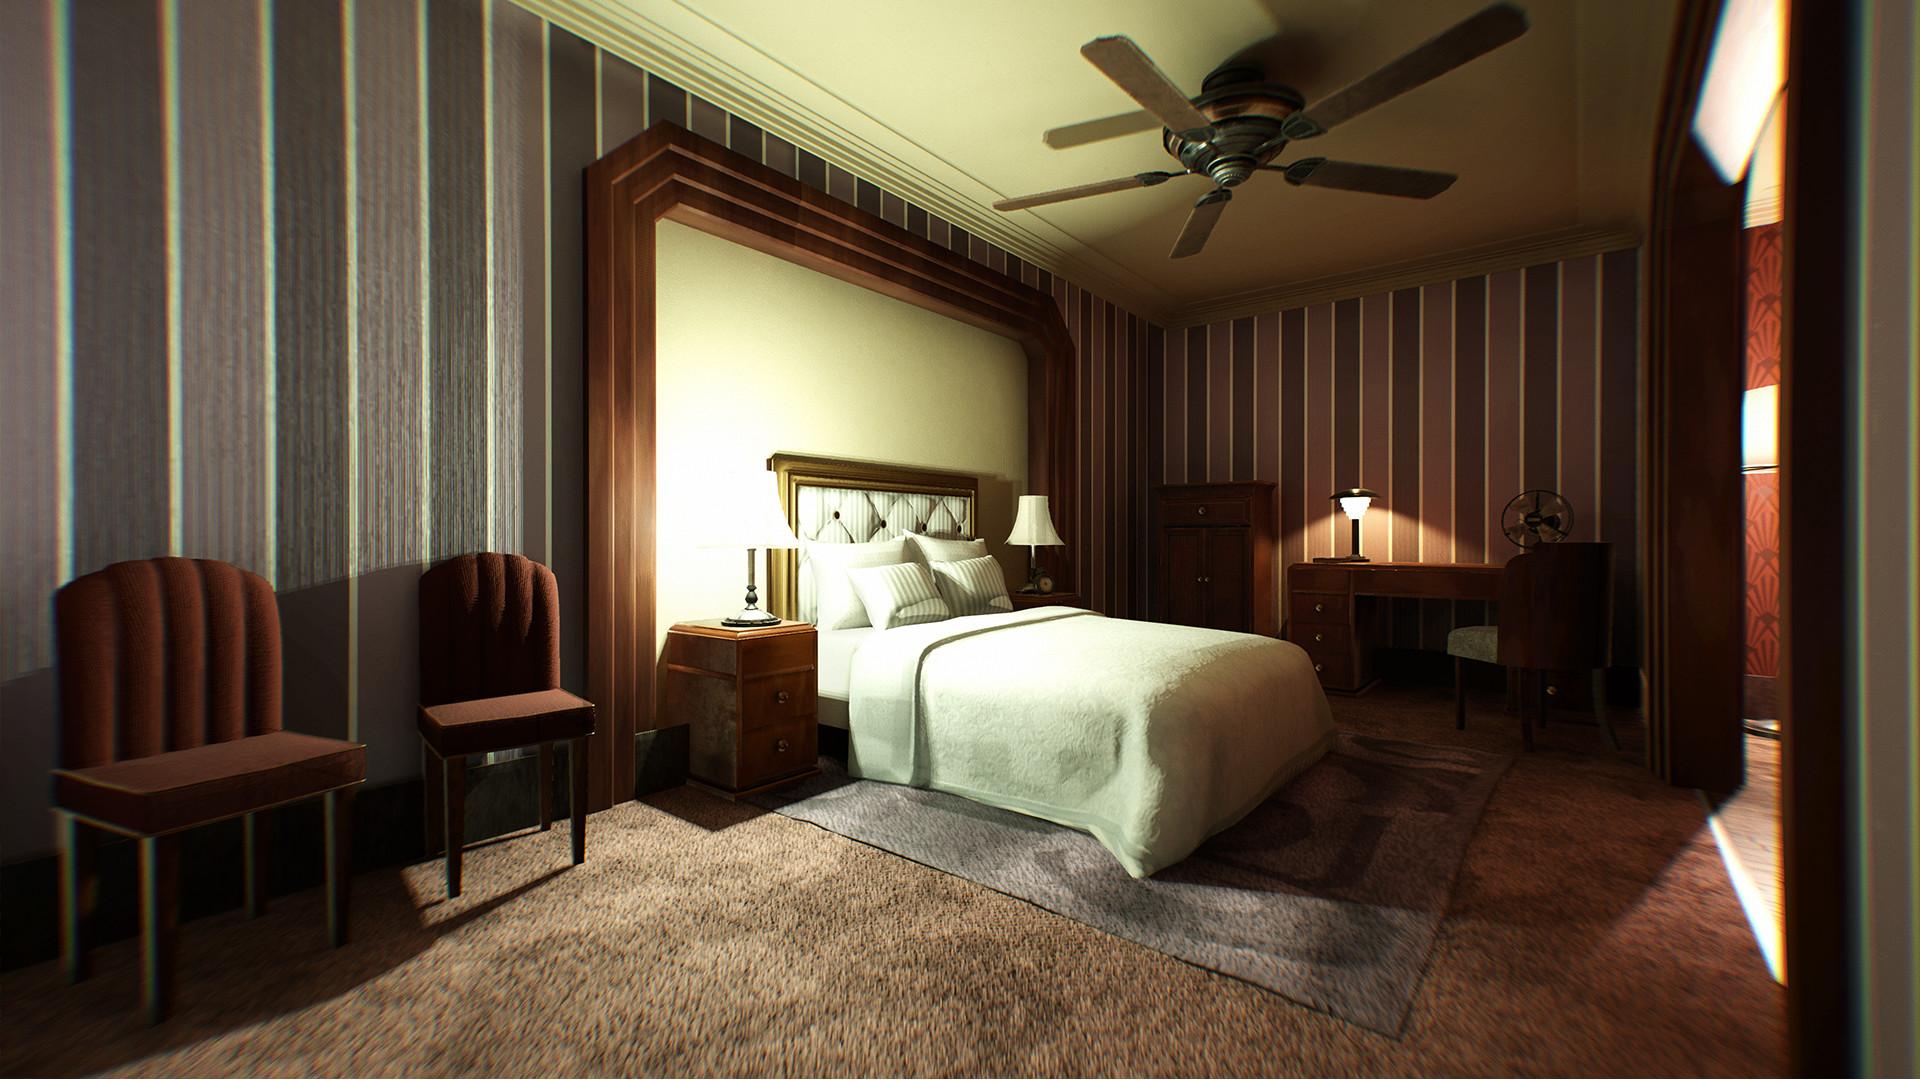 Augustin grassien bedroom 05